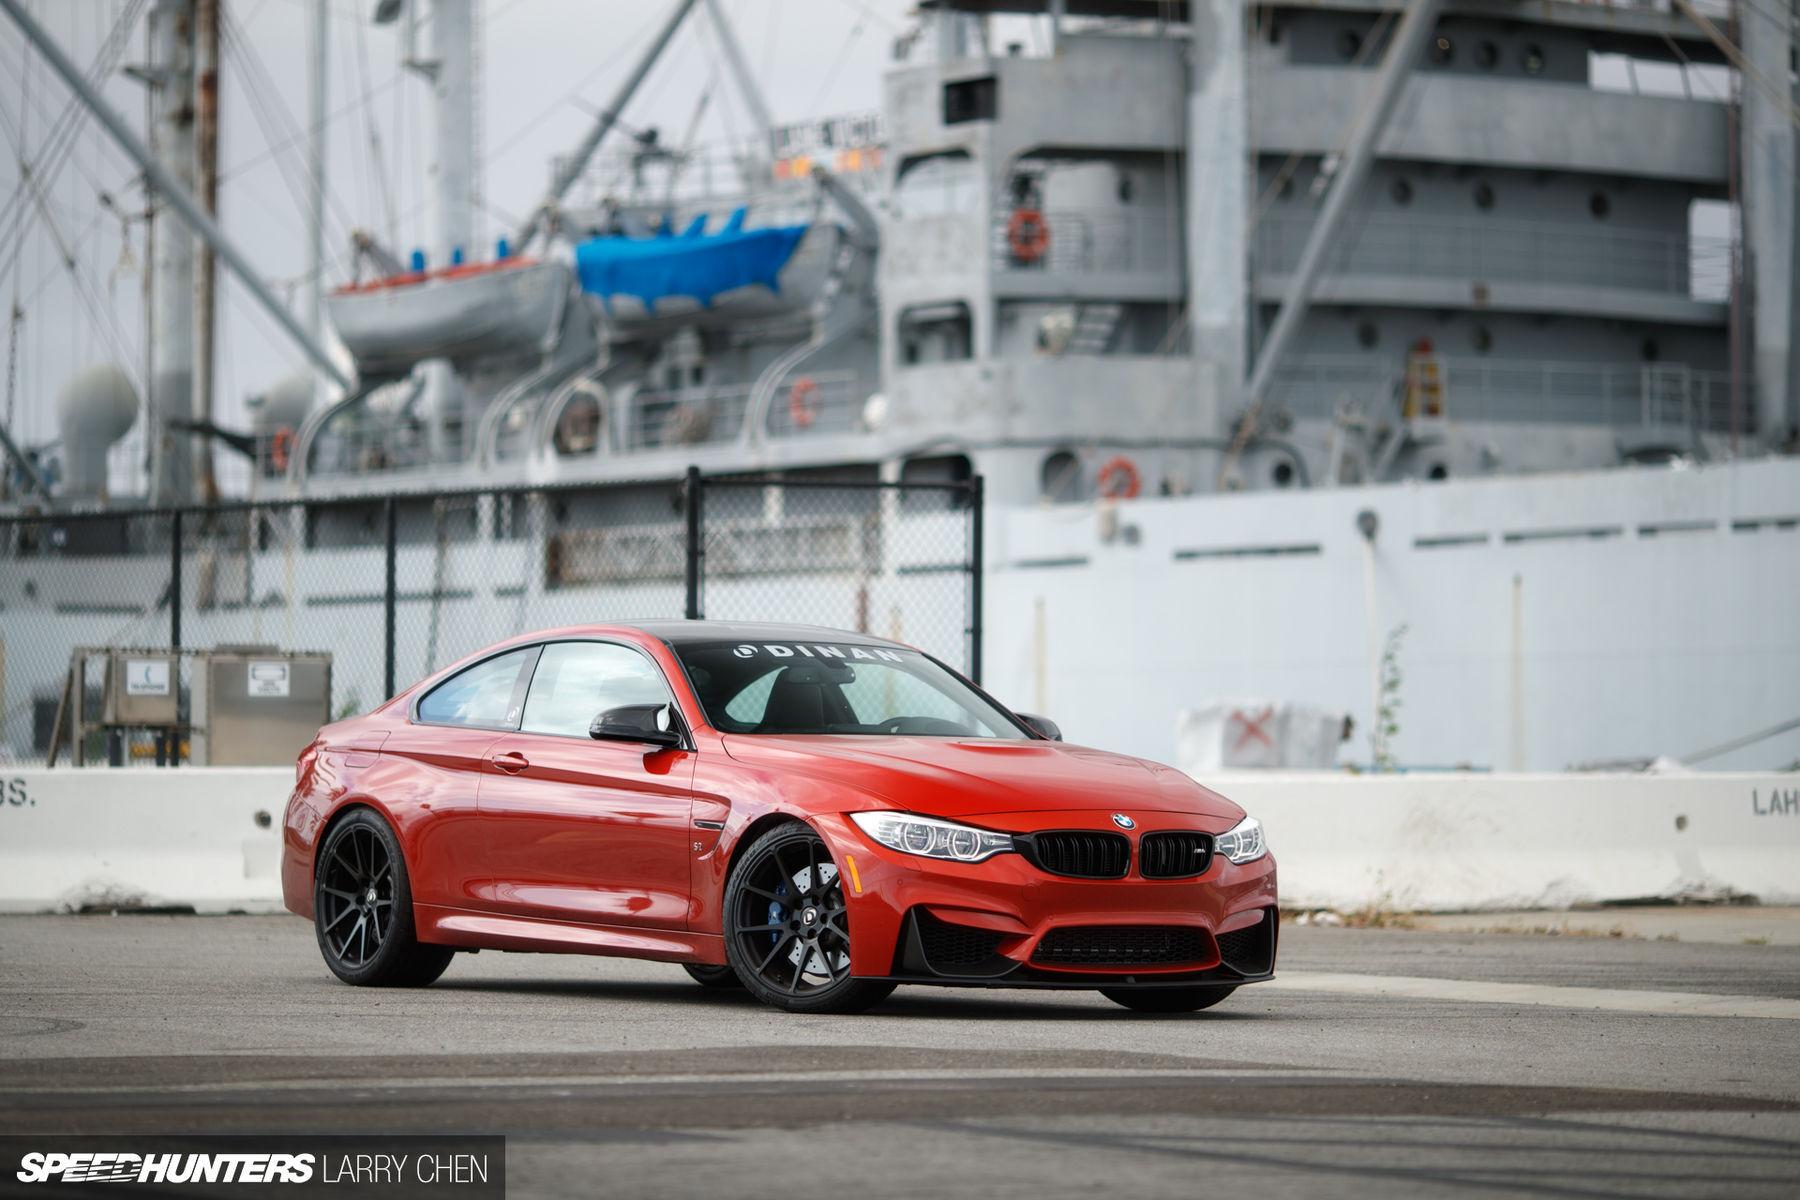 2017 BMW M4 | Dinan Engineering's BMW S2 M4 on Forgeline One Piece Forged Monoblock GA1R Wheels